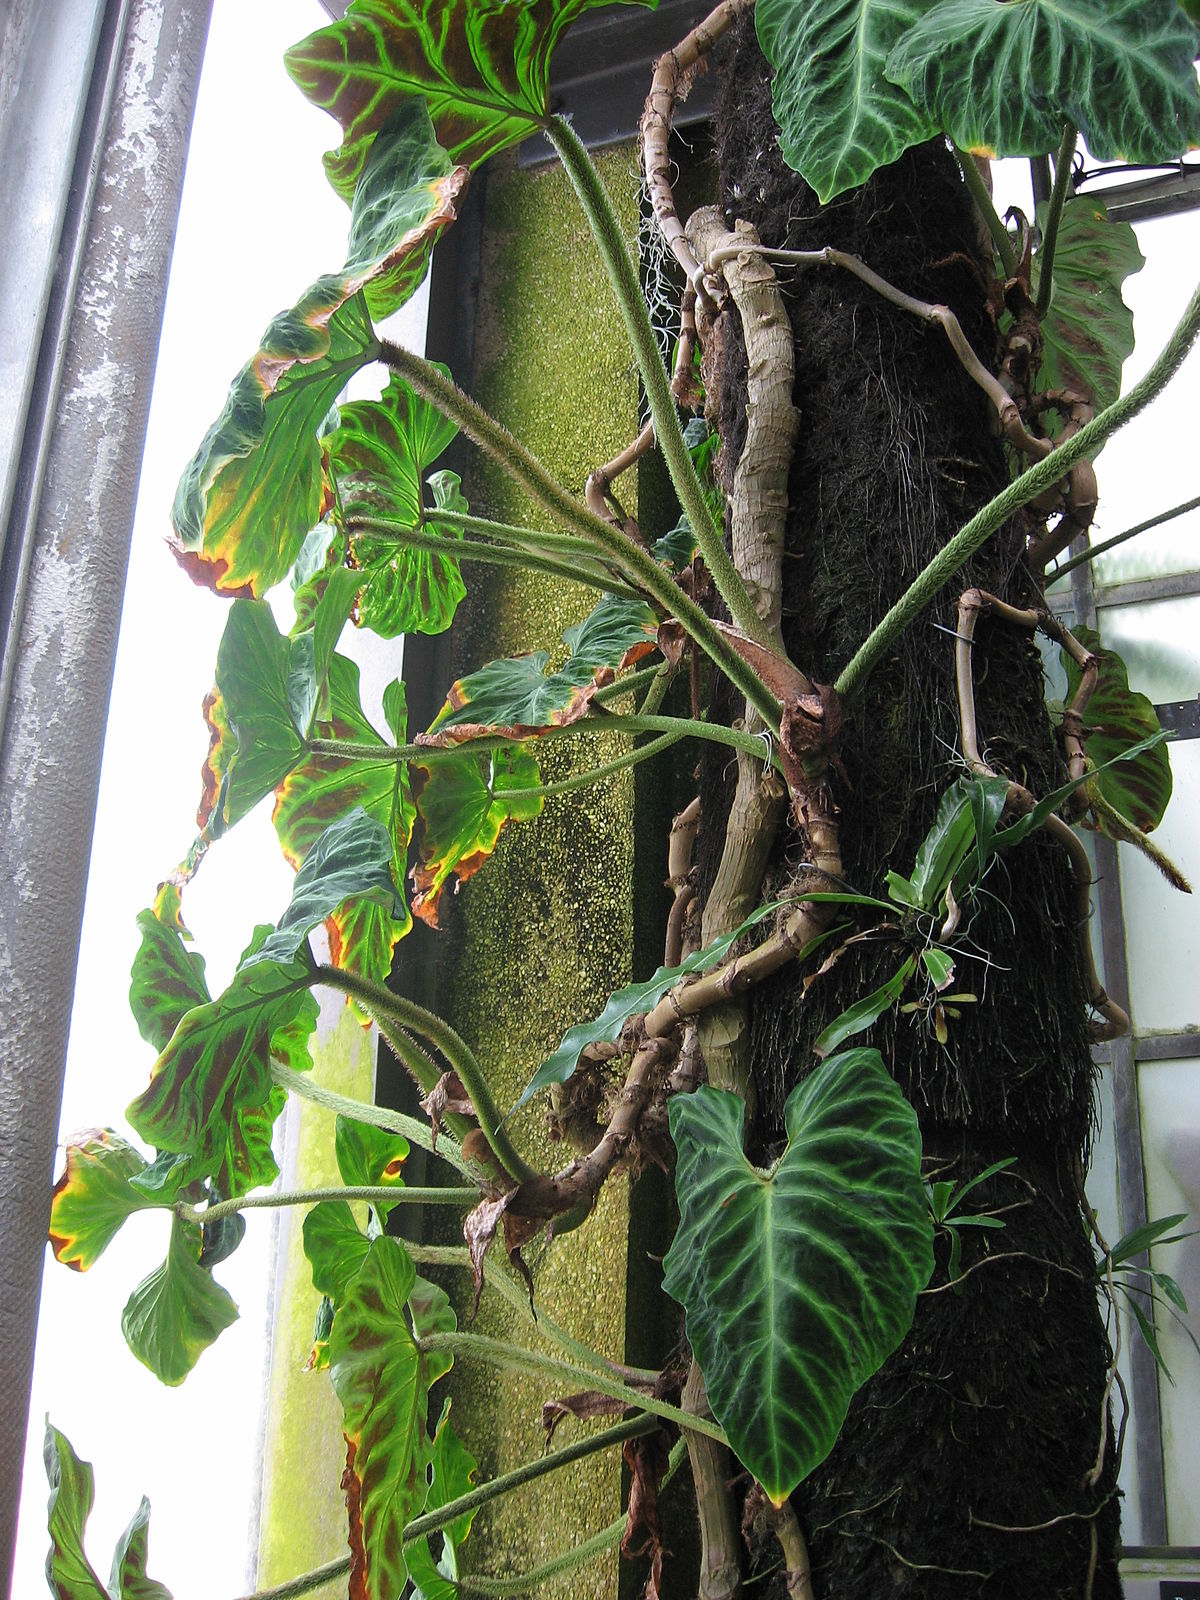 Philodendron Verrucosum Wikipedia